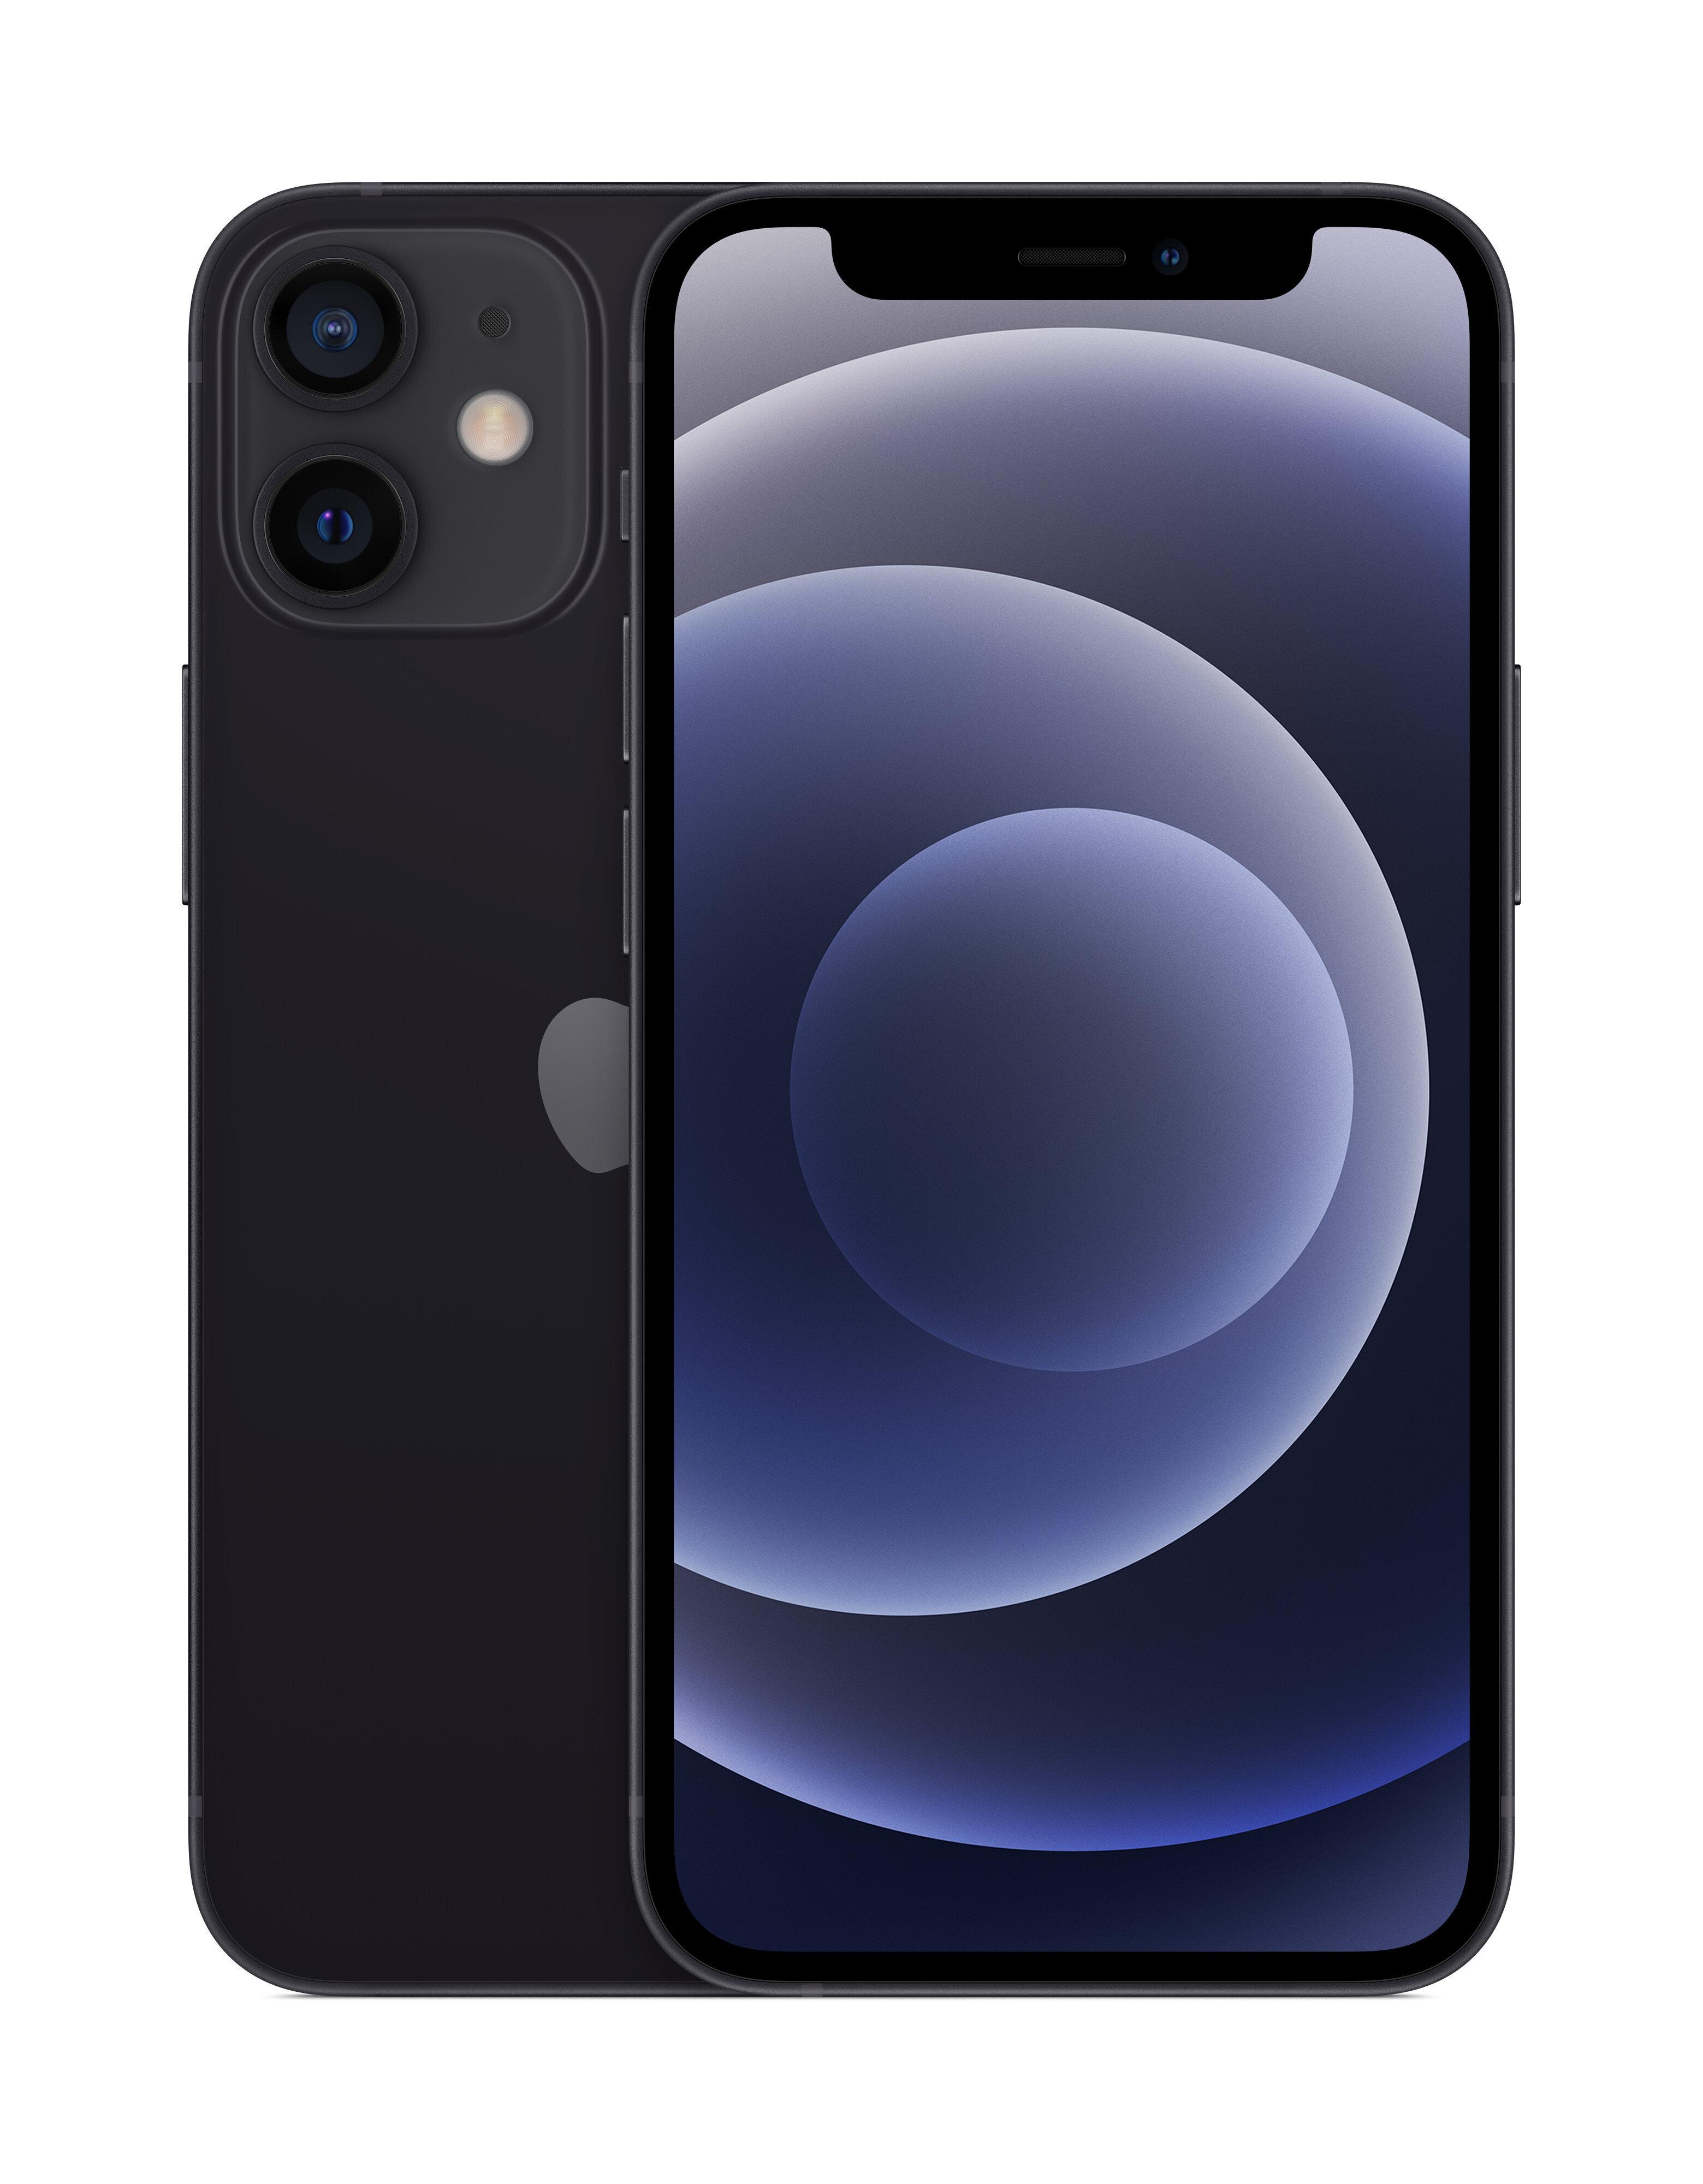 Apple iPhone 12 Mini, 128GB, Black